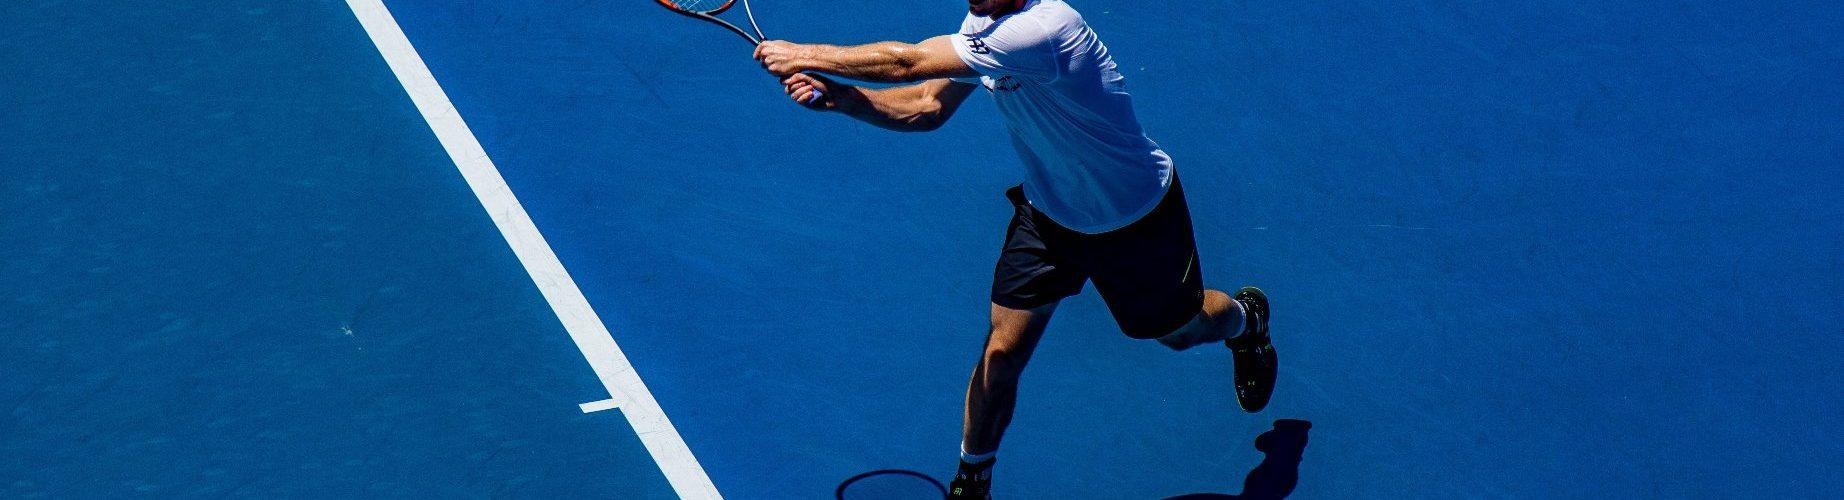 sport-doctor-monaco-tennis-masters